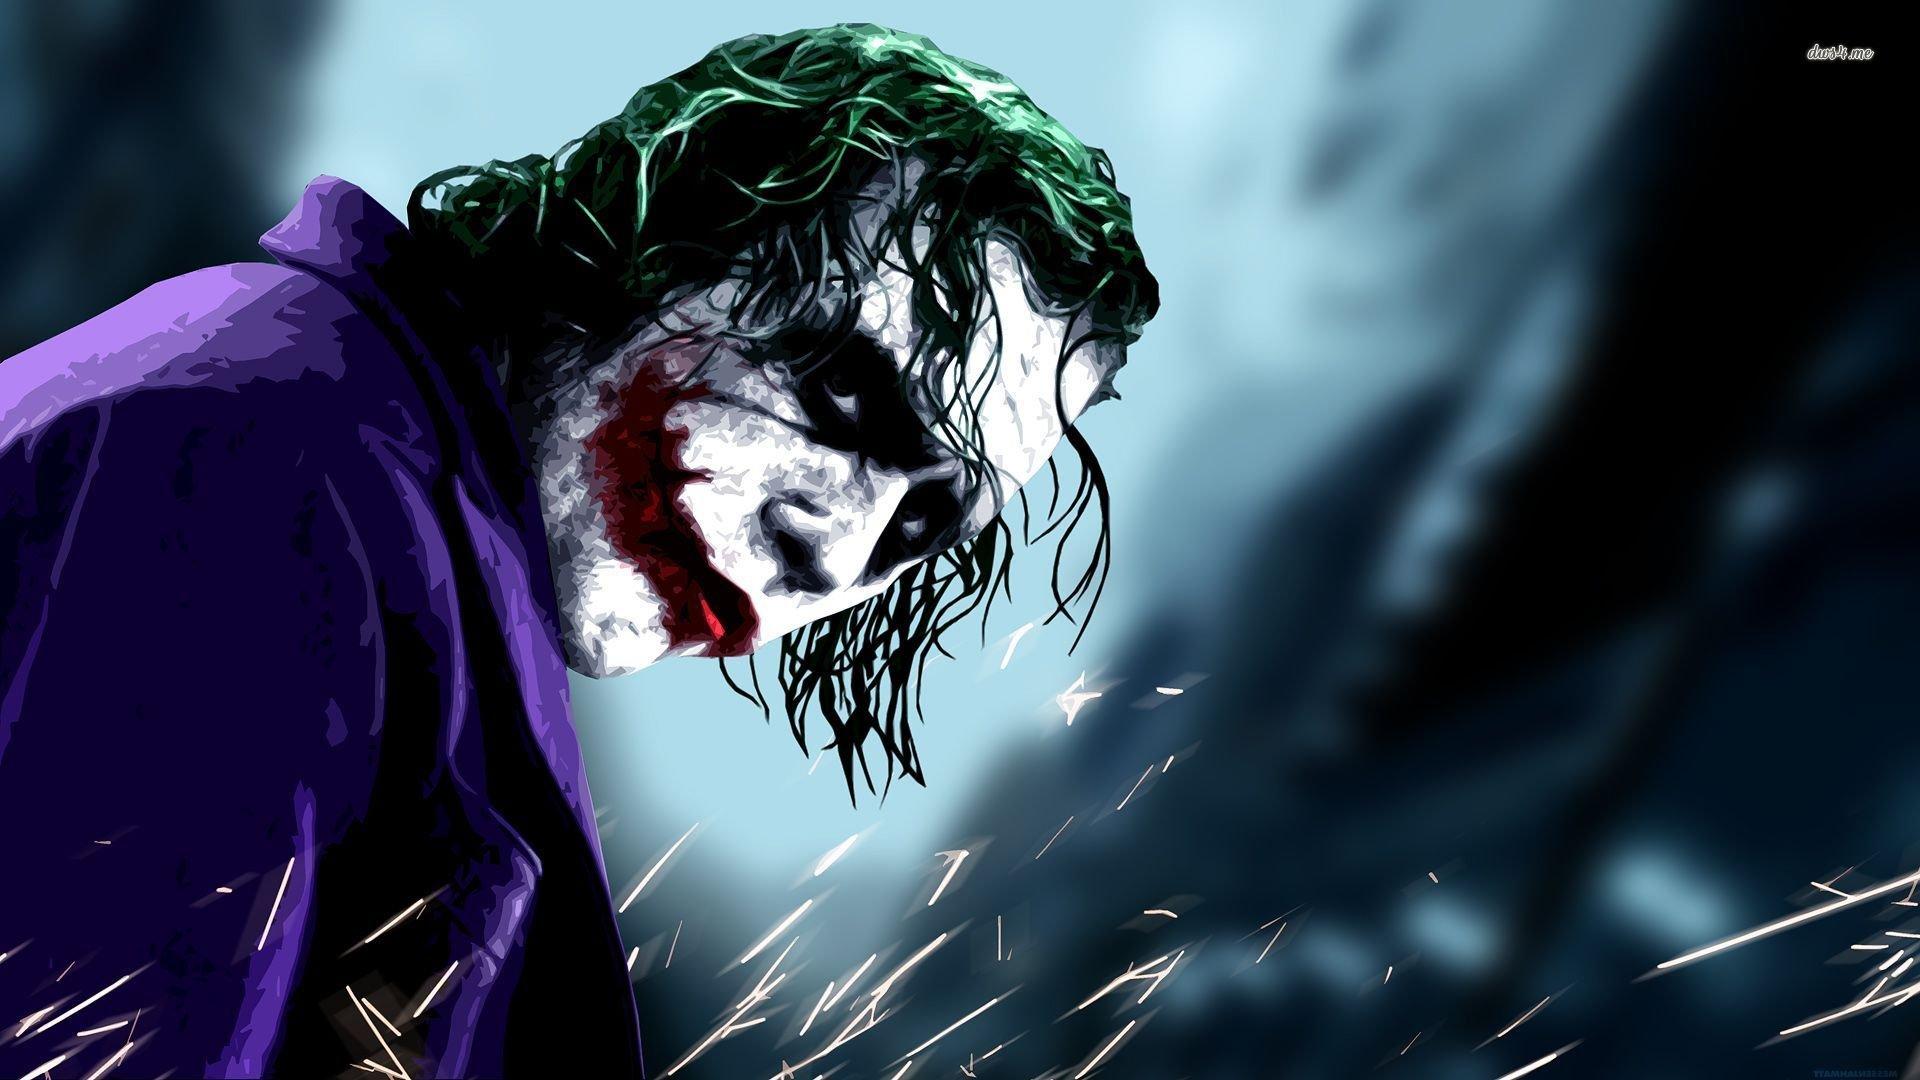 The Joker The Dark Knight Hd Bonny Wallpaper Free Download The 1920x1080